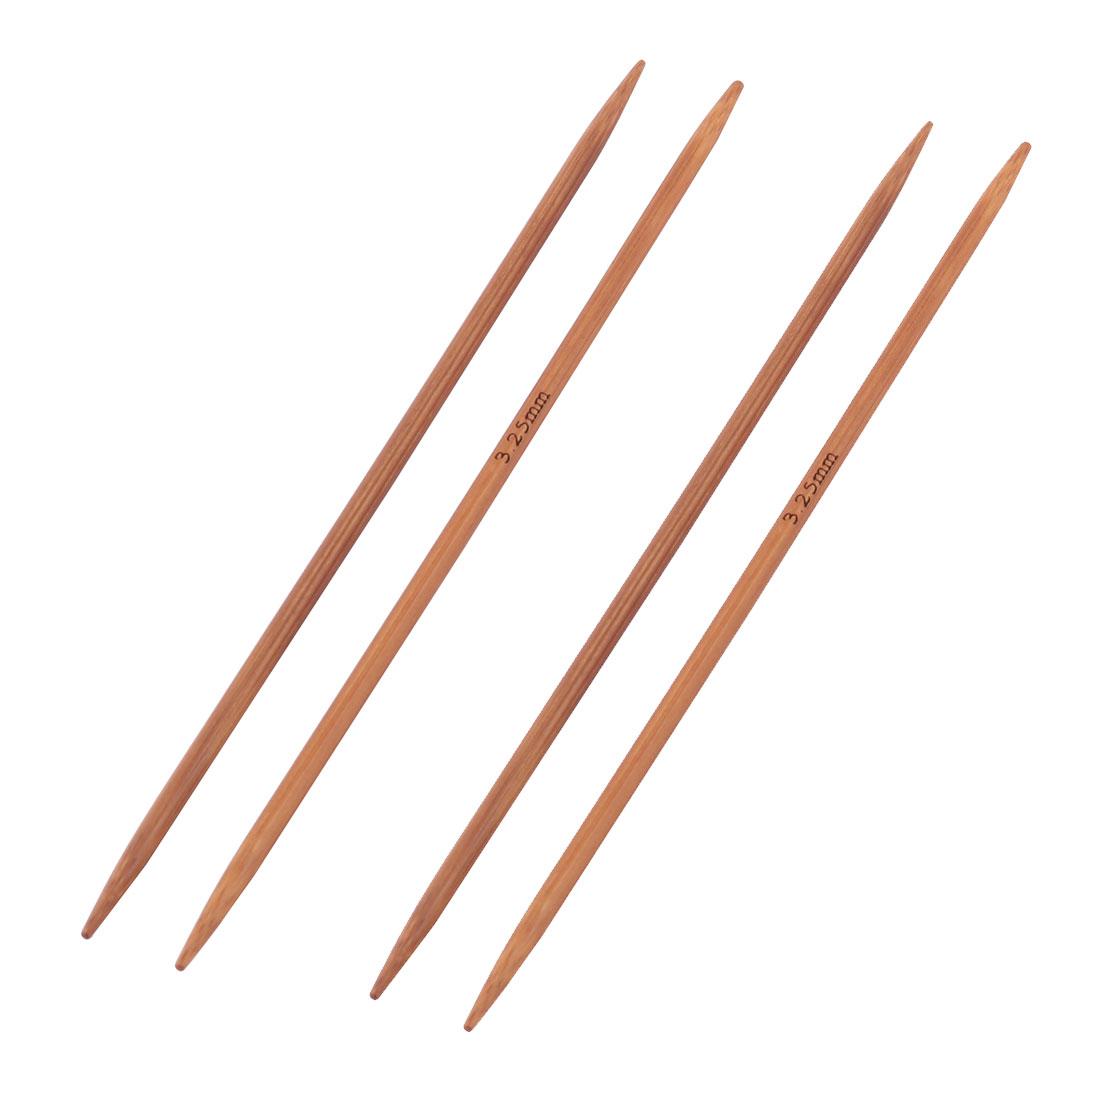 Bamboo Sewing Knitting Tatting Hat Socks Golves Needles Brown 3.25mm Dia 4pcs